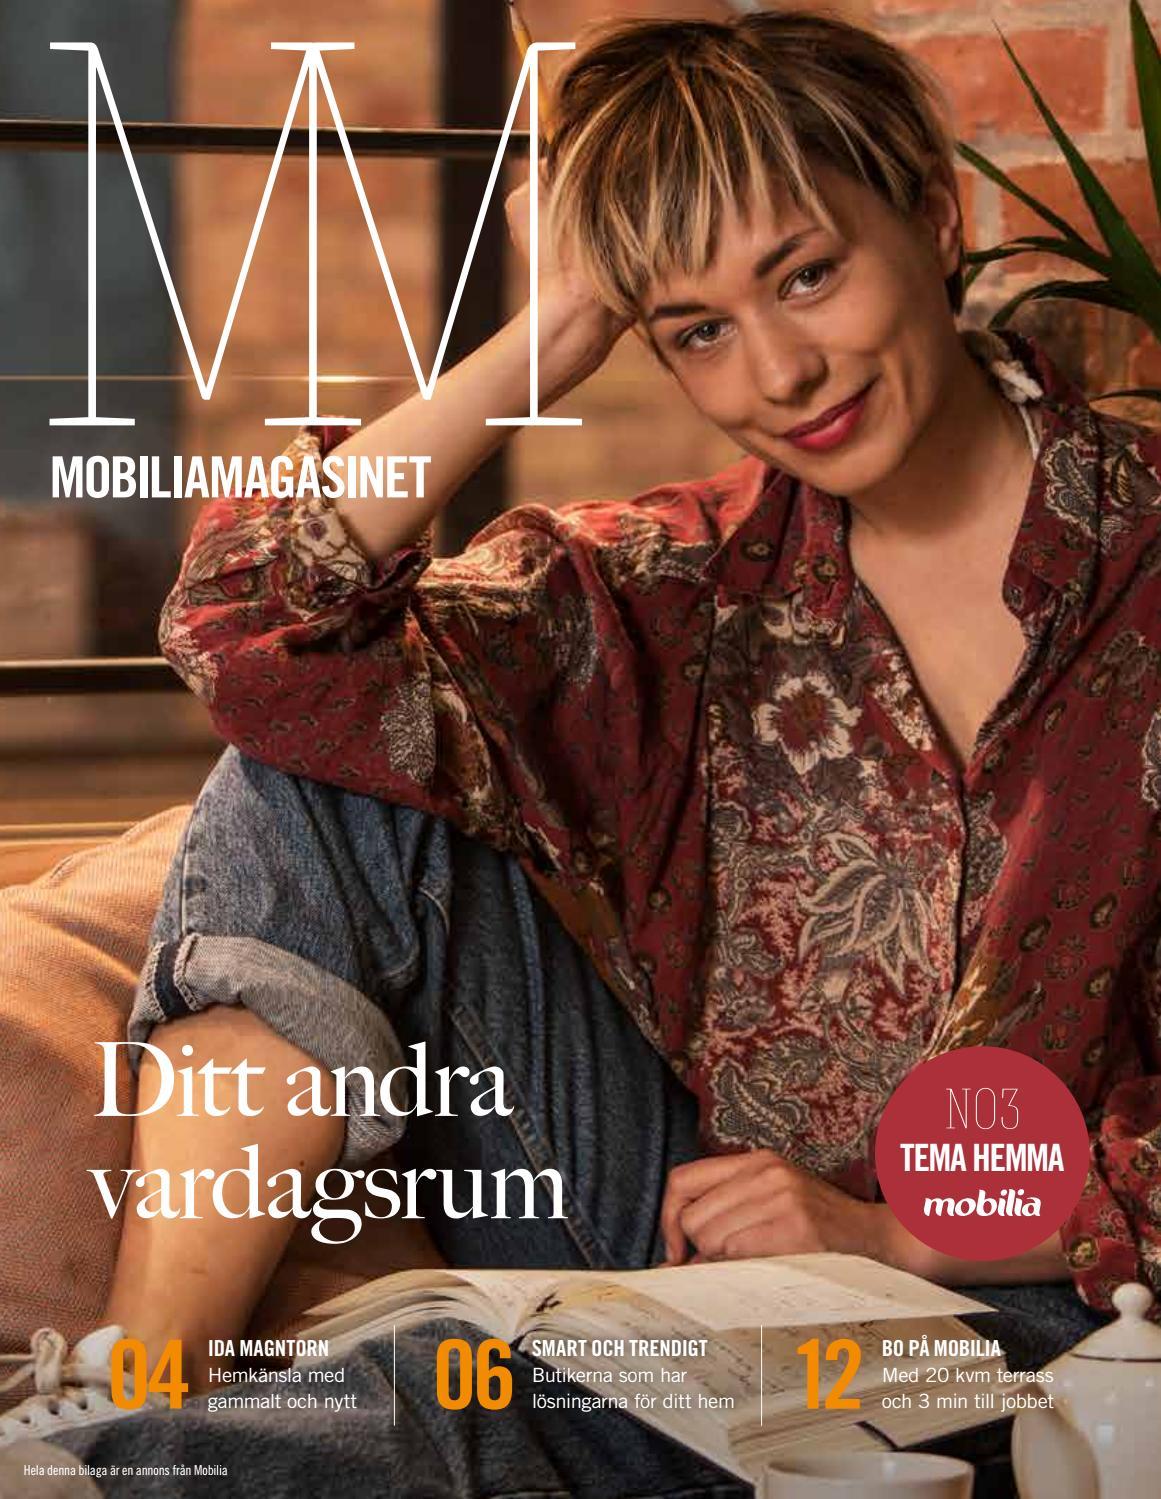 Mobilia magasinet nr03 by atrium ljungberg issuu for Mobilia 1